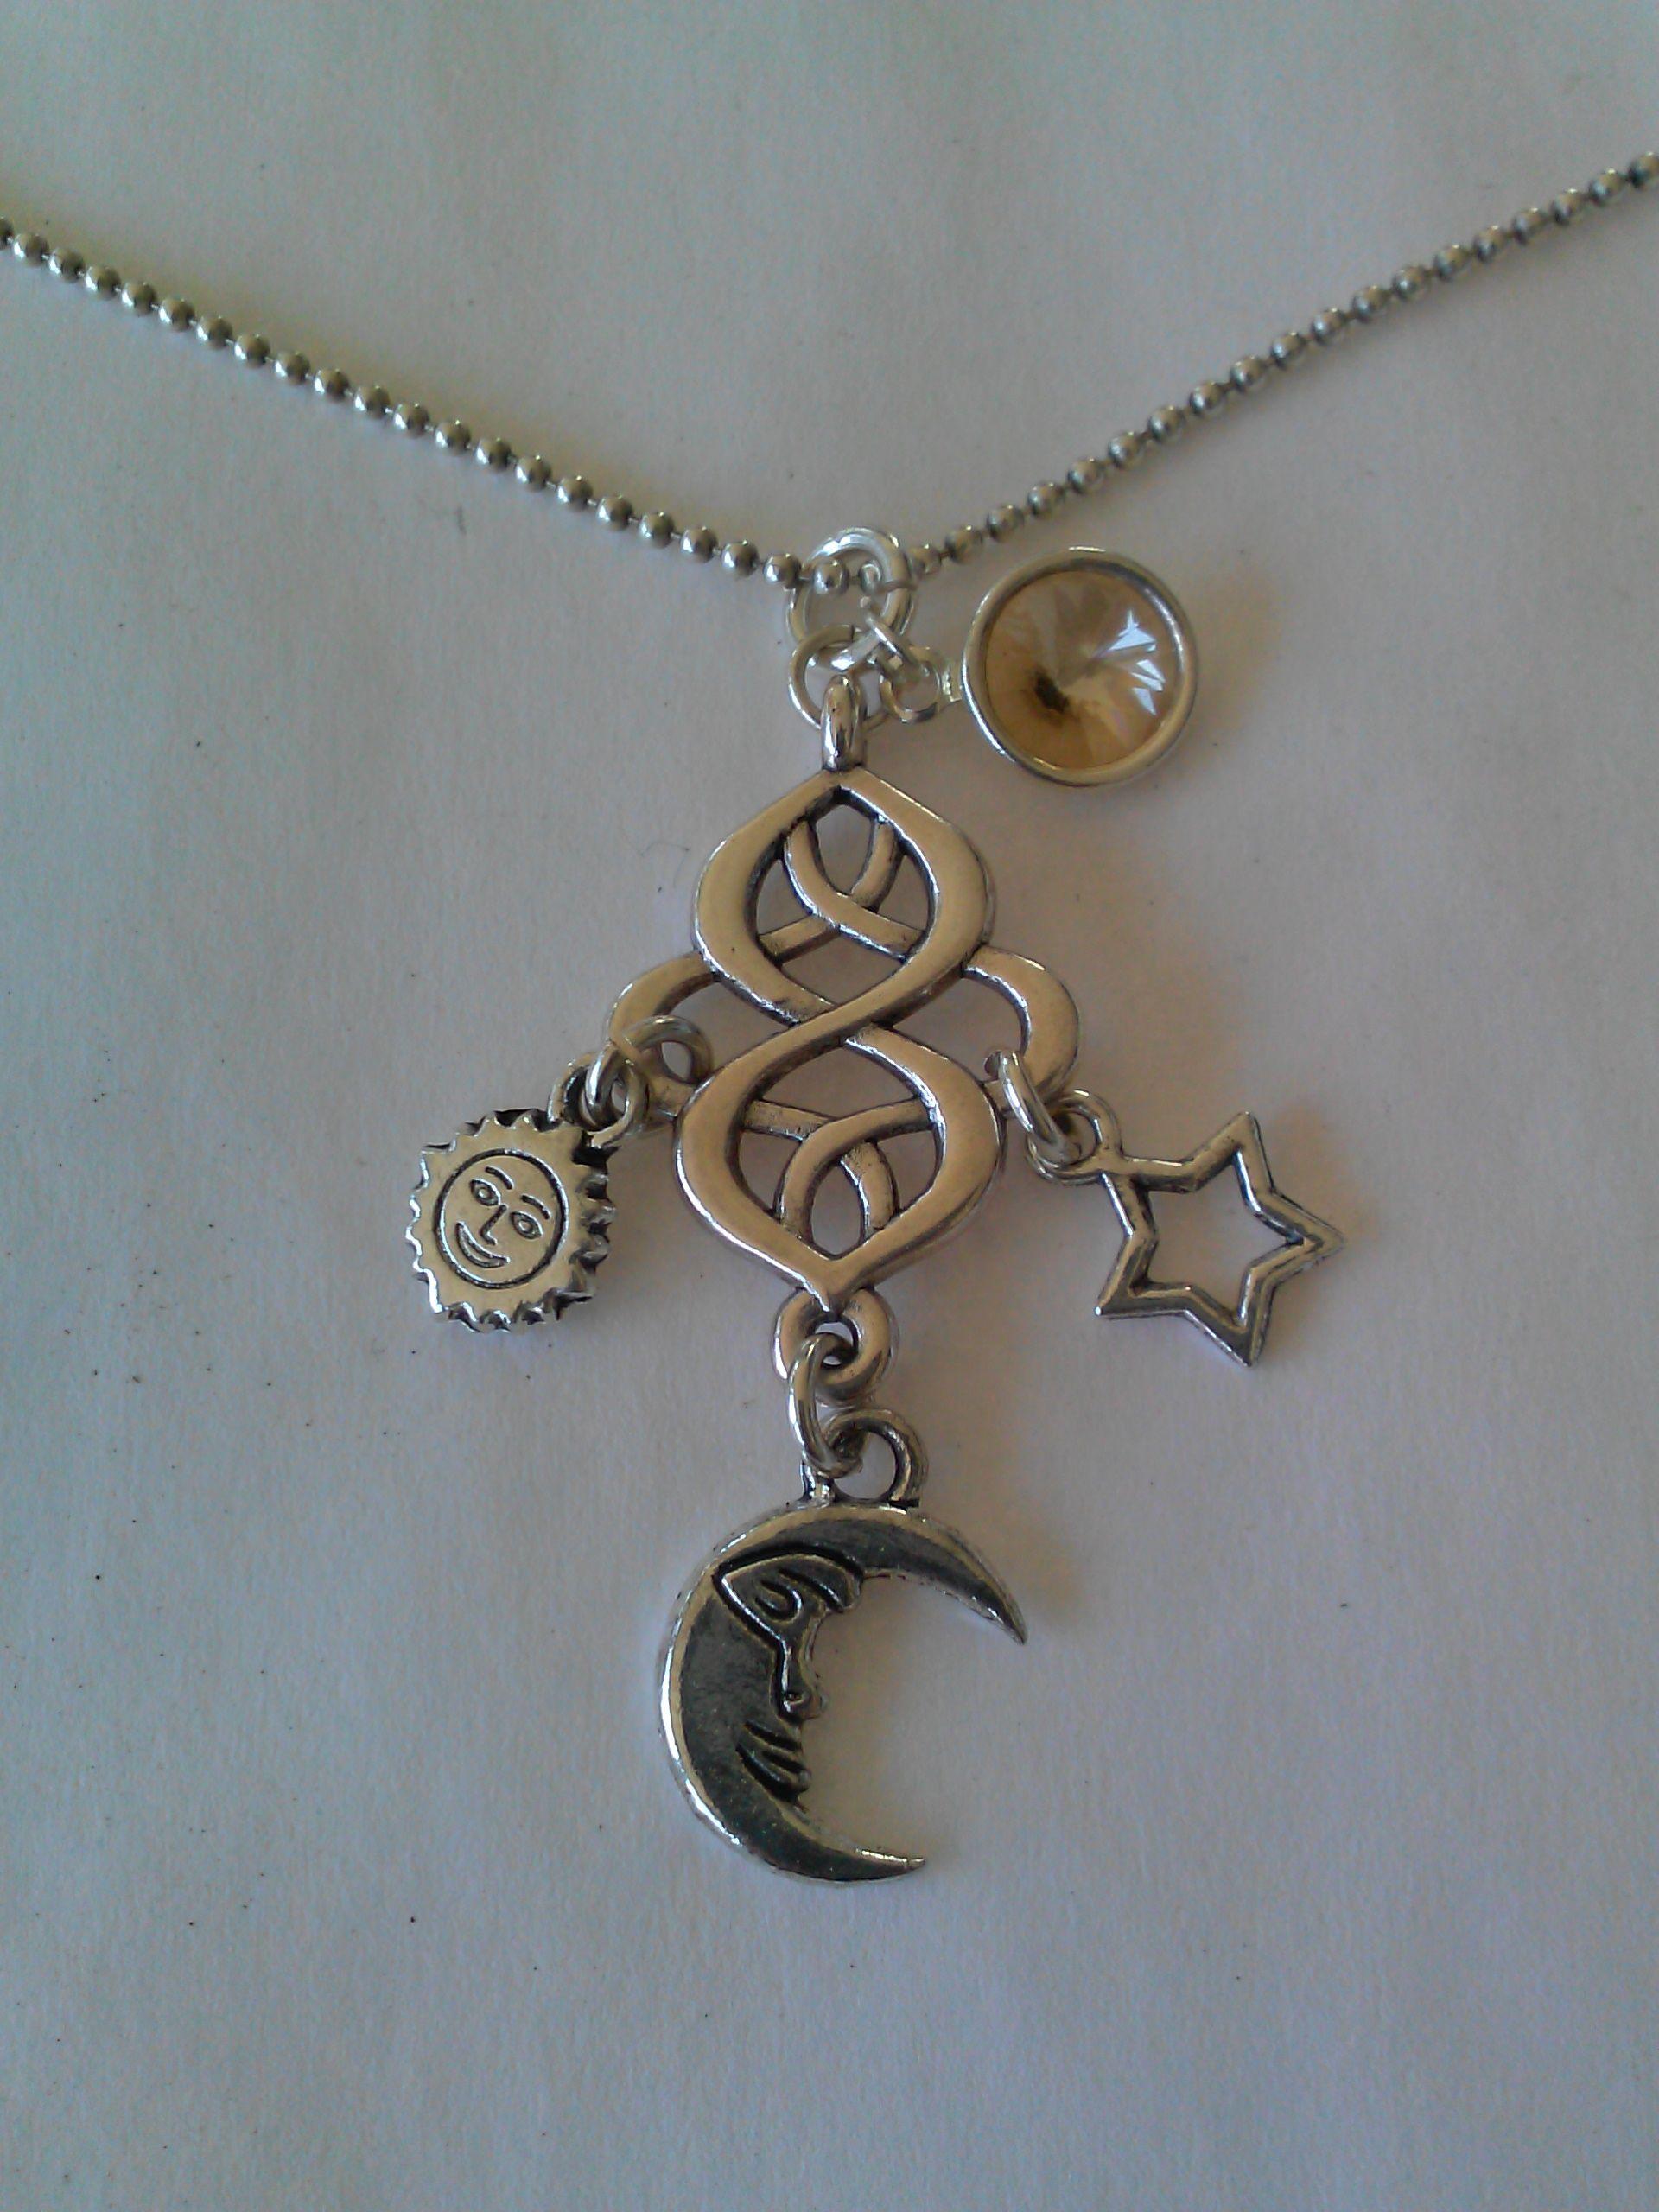 ab3ec80addd Celestial necklace, infinity connector, Swarovski crystal channel, golden  shadow, sunface charm,